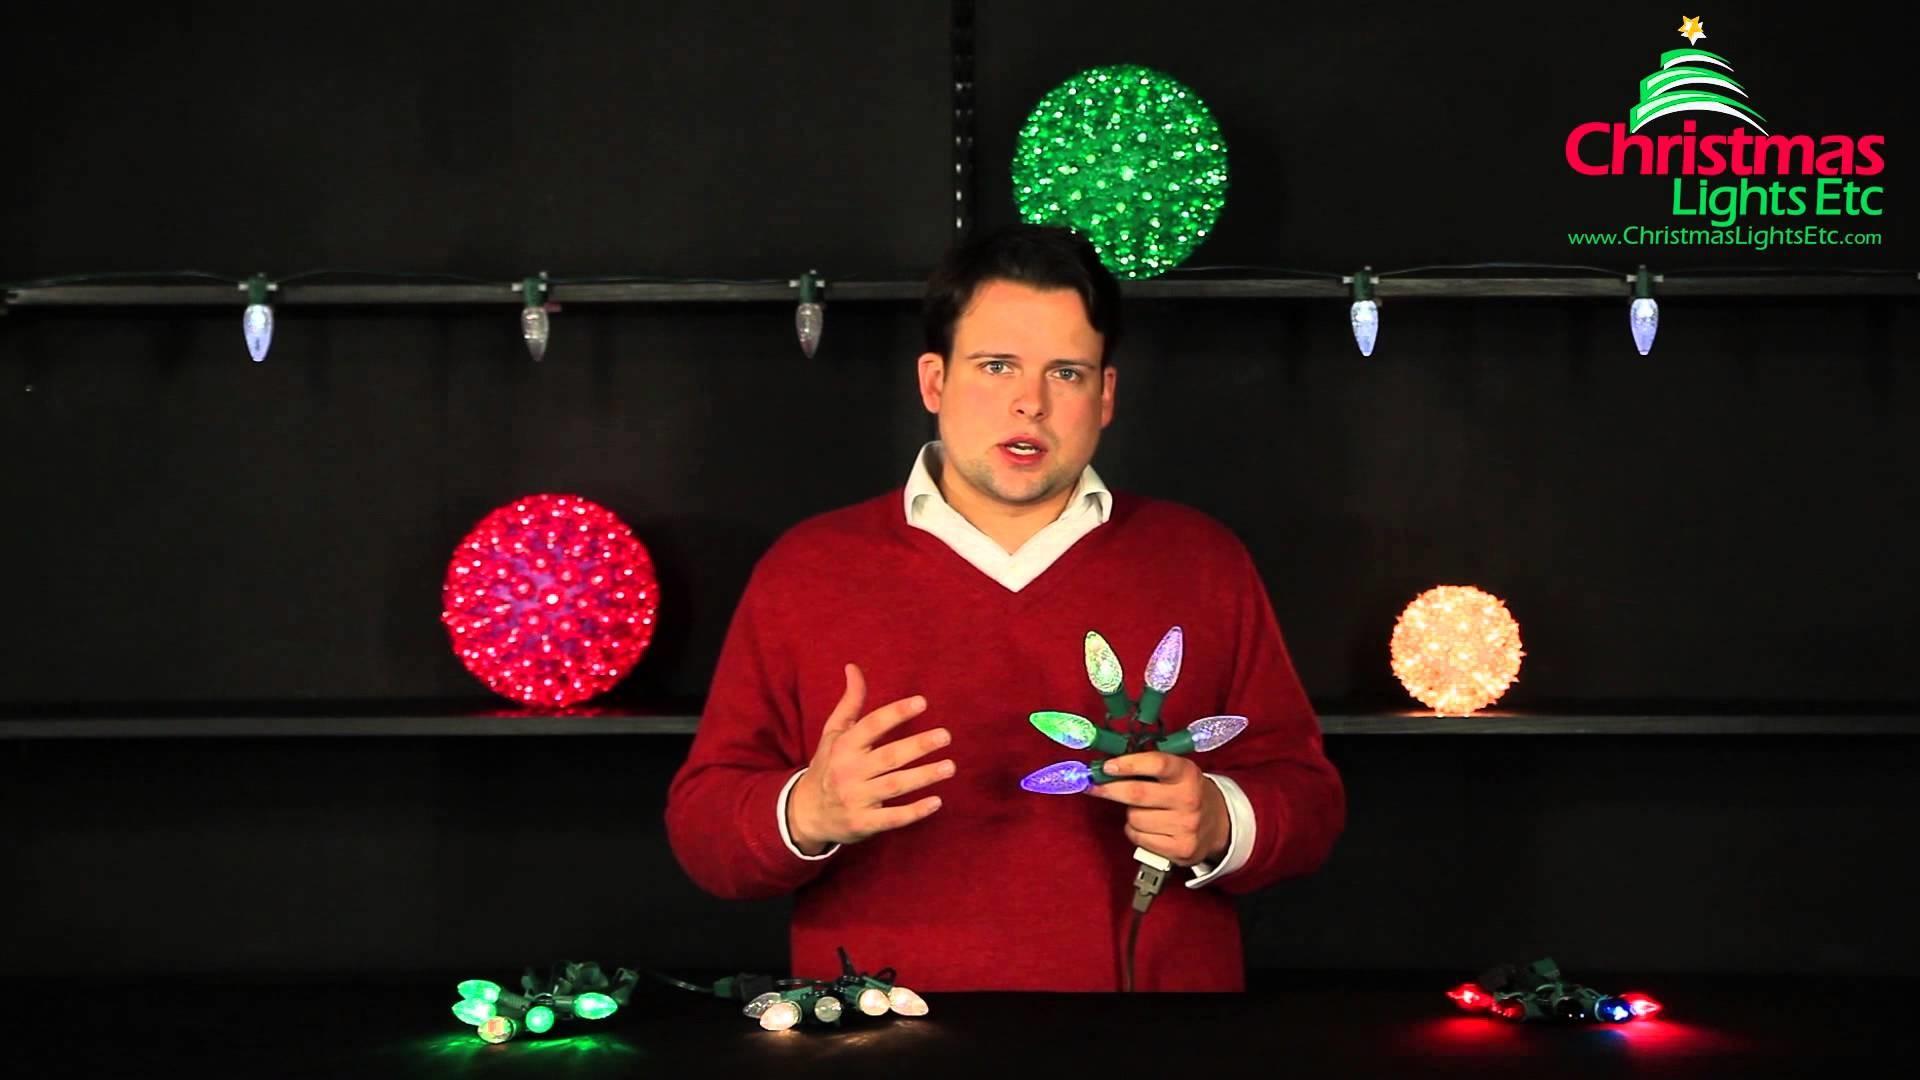 Christmas Light Decorating Ideas: Twinkle Christmas Lights and Color Change Lights